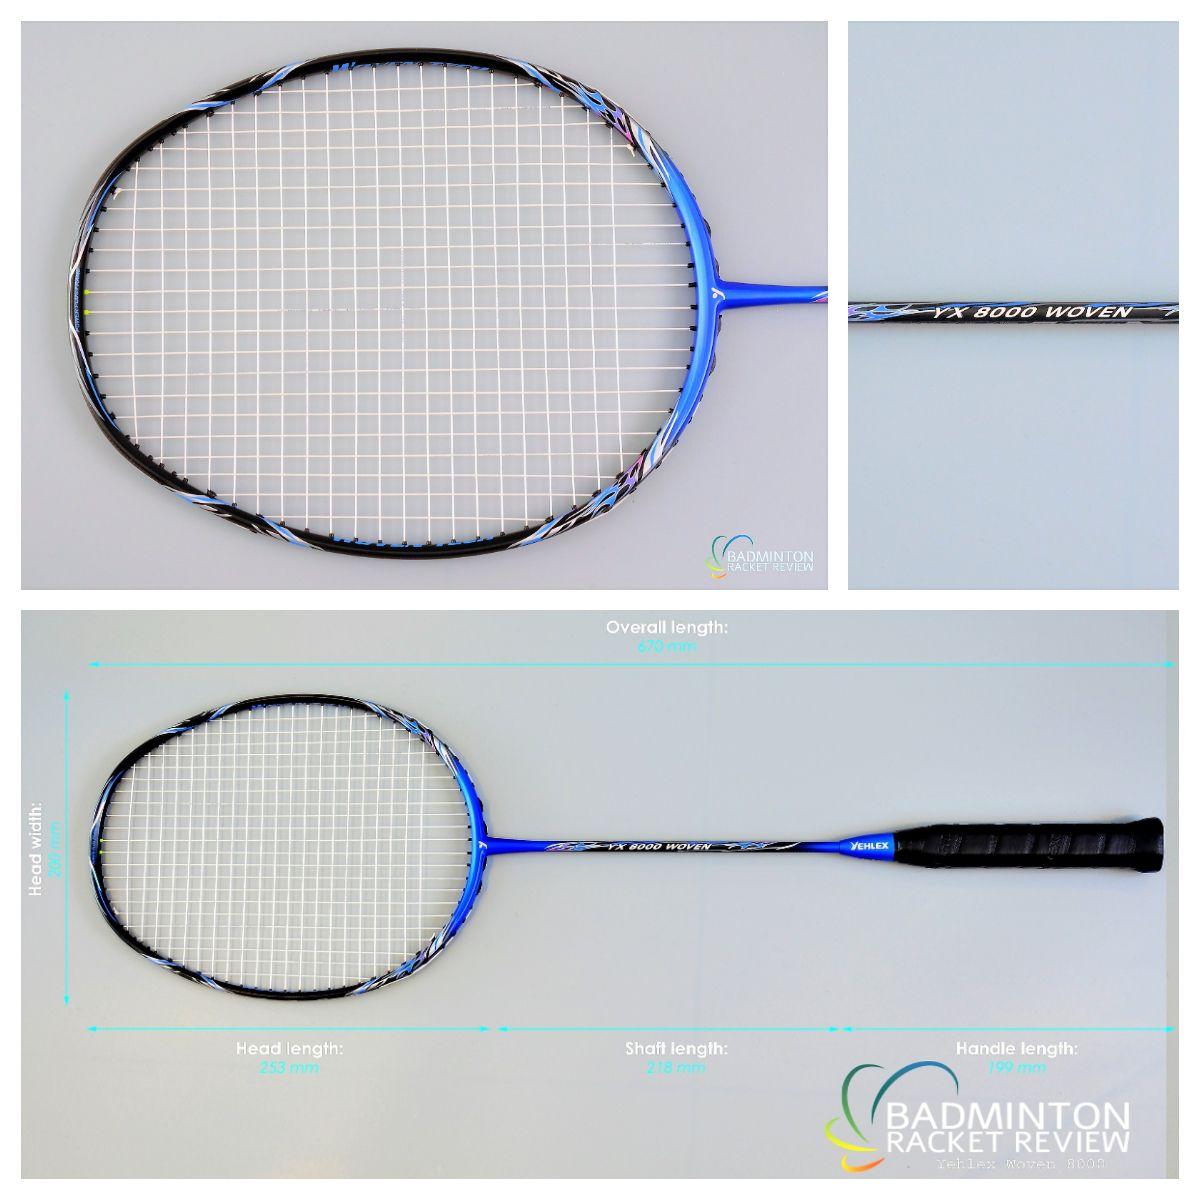 Yehlex/Fleet Woven YX8000 Badminton Racket Review. To find ...